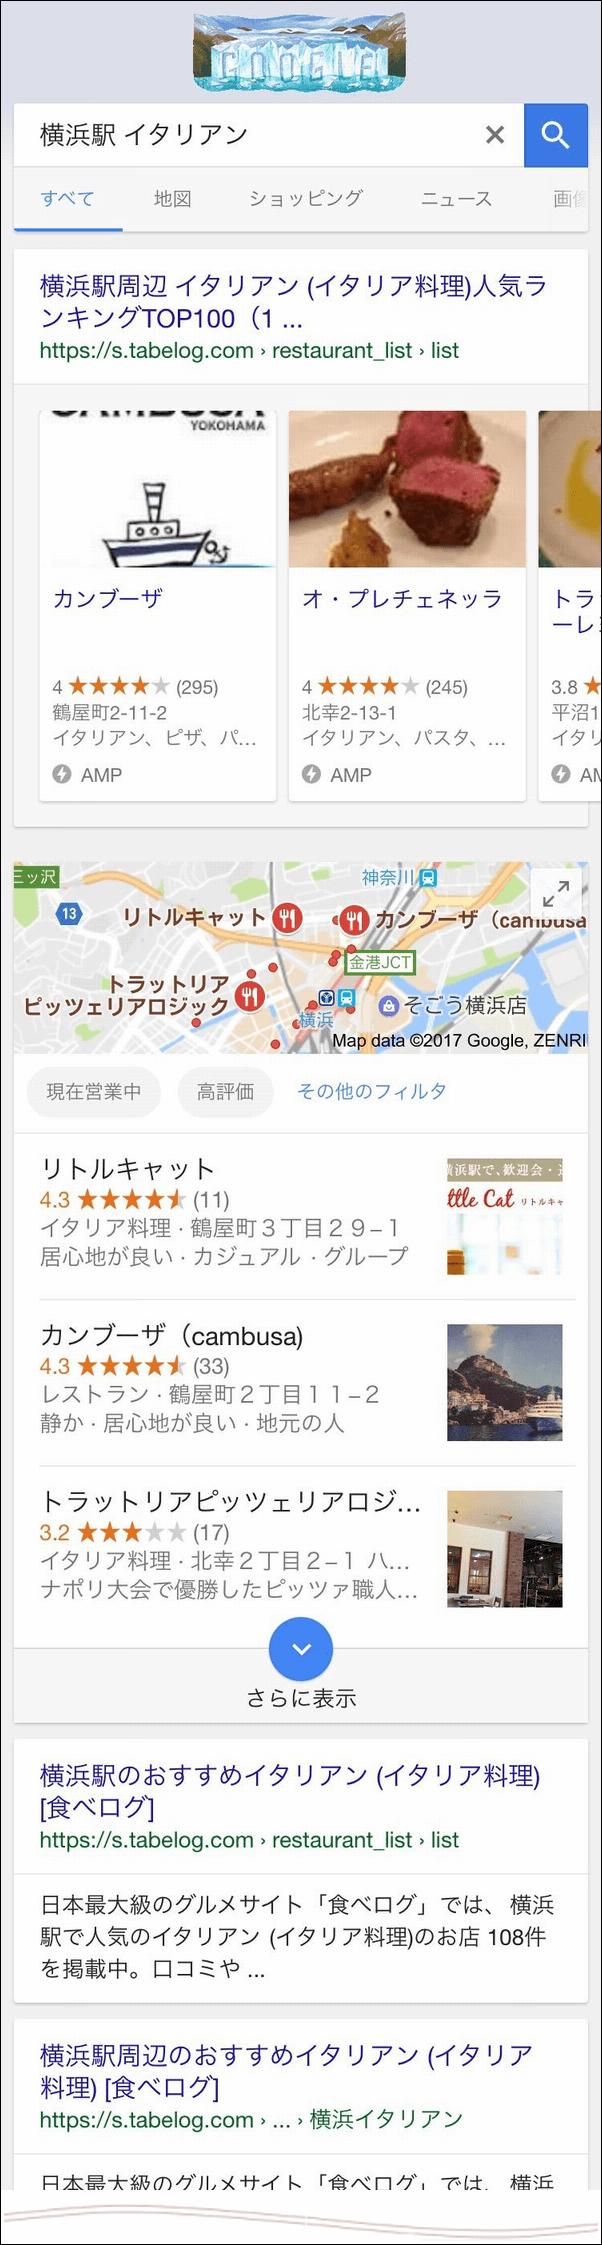 Googleで「横浜駅 イタリアン」と検索してみた結果